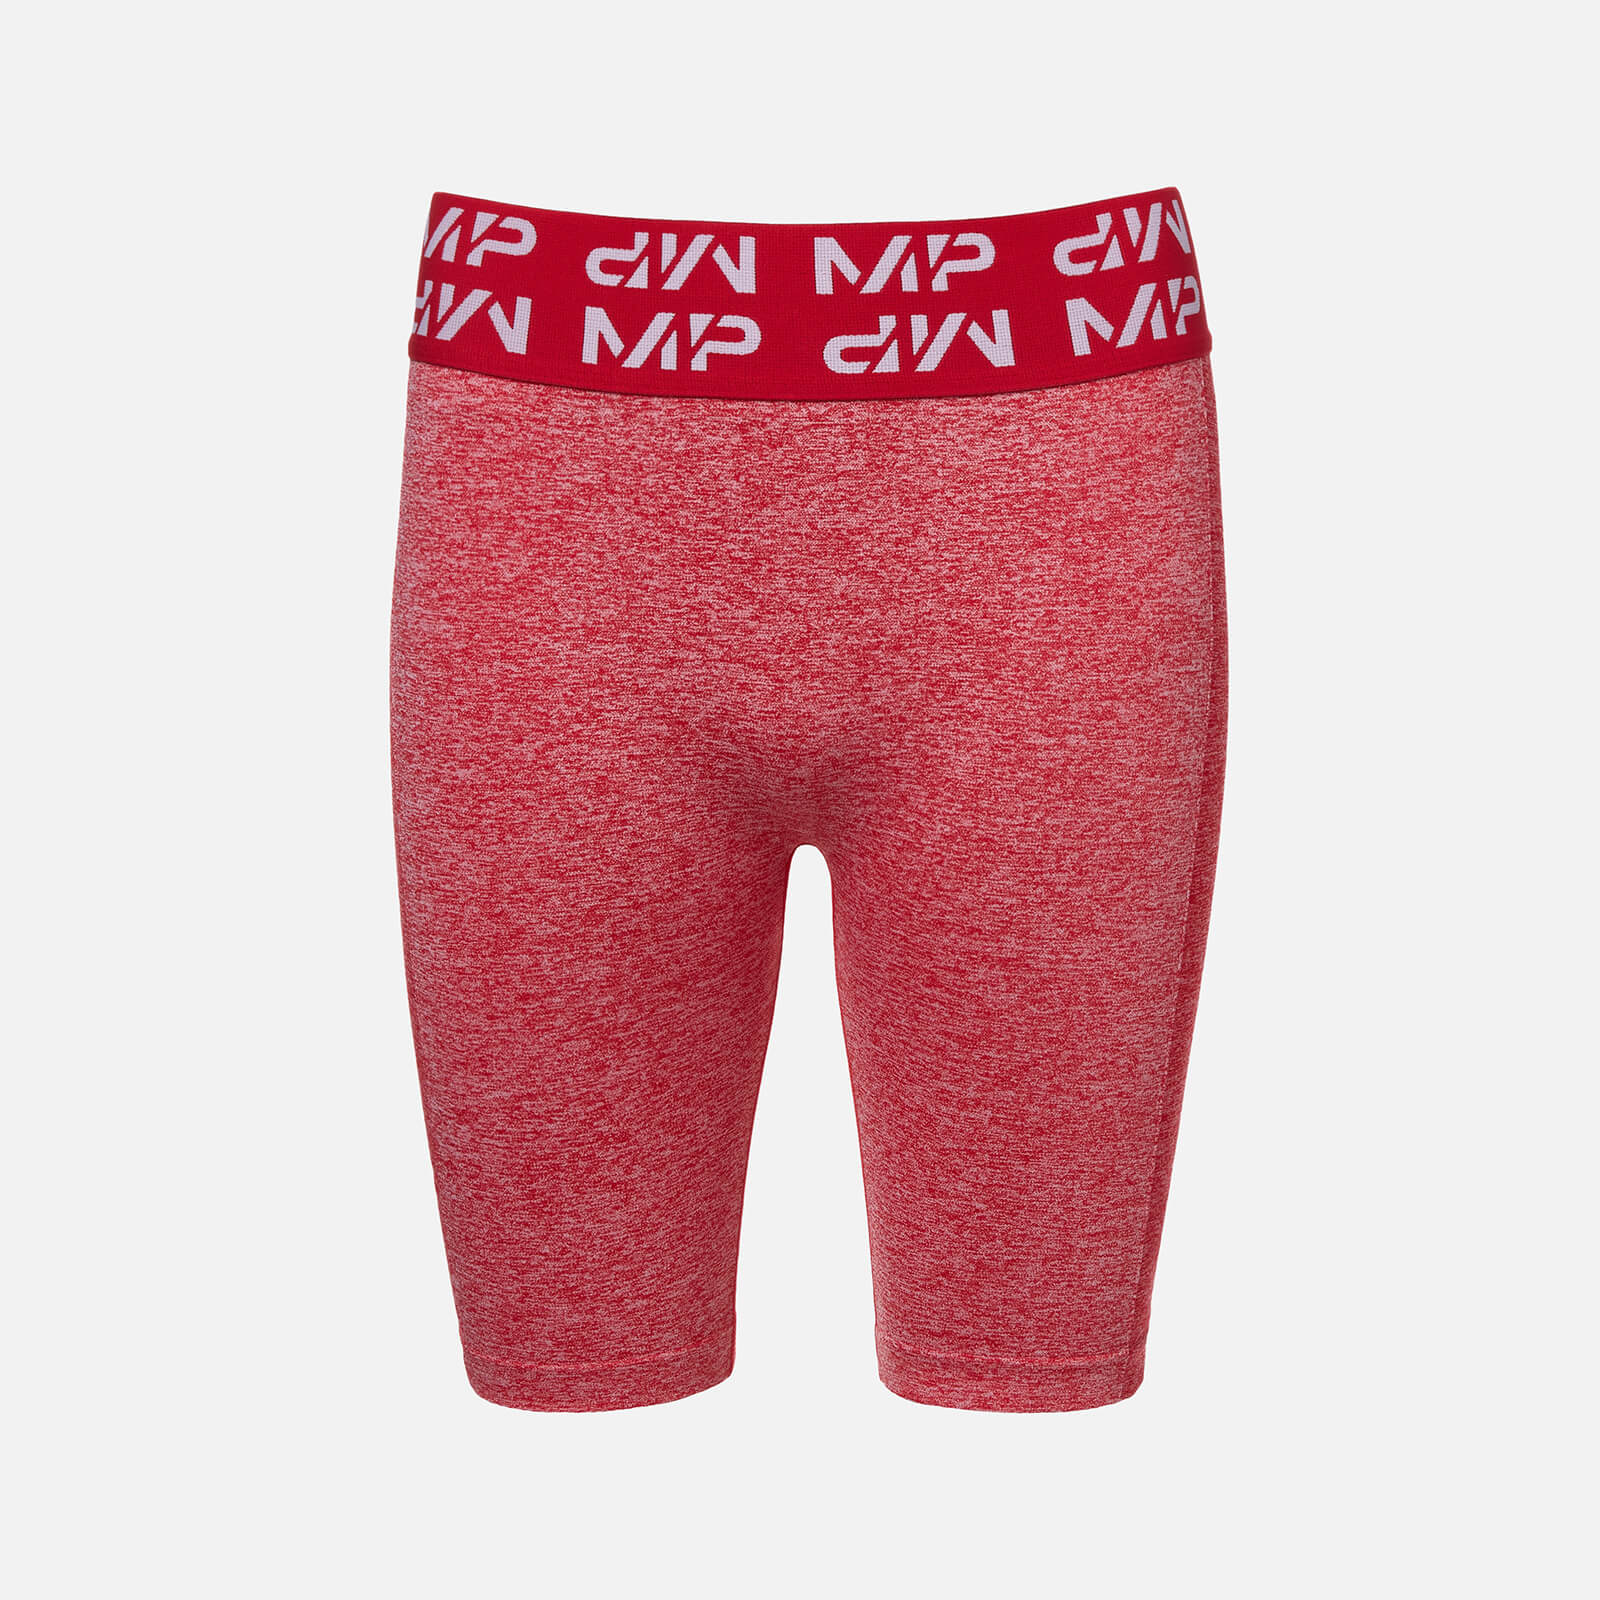 Myprotein Curve Cycling Shorts - Röd - XS